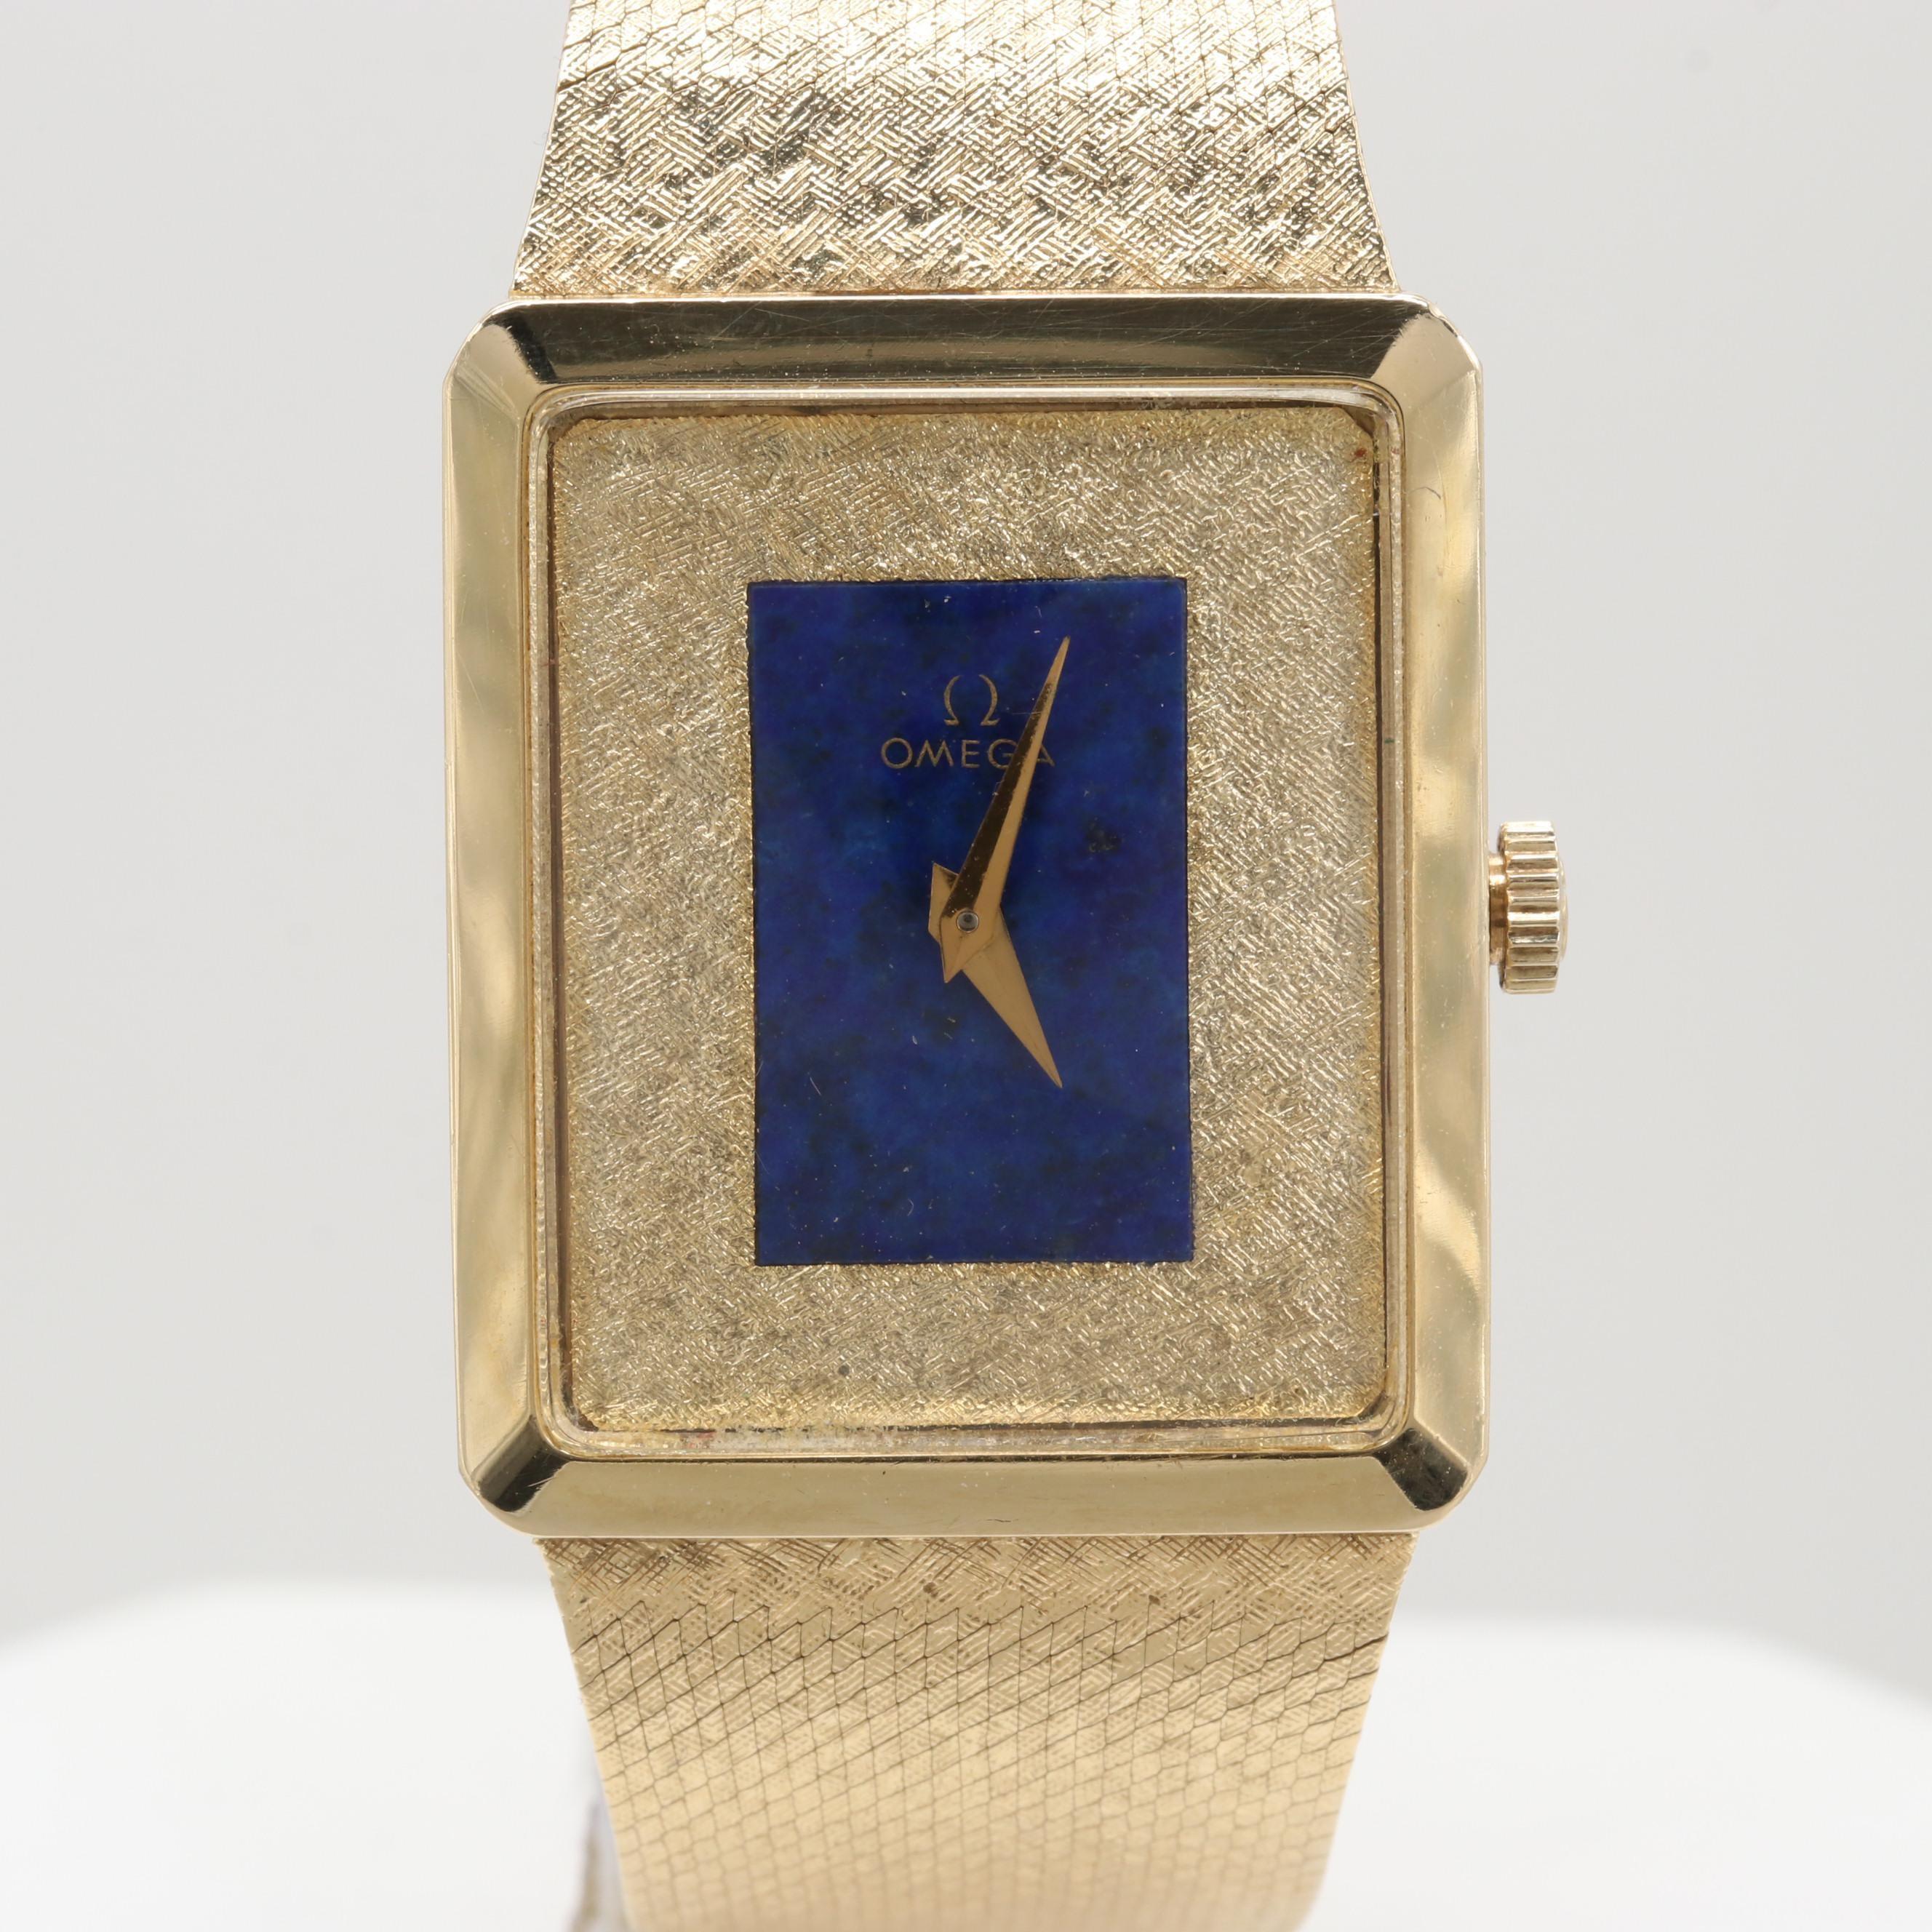 Omega 14K Yellow Gold Manual Winding Lapis Dial Wristwatch